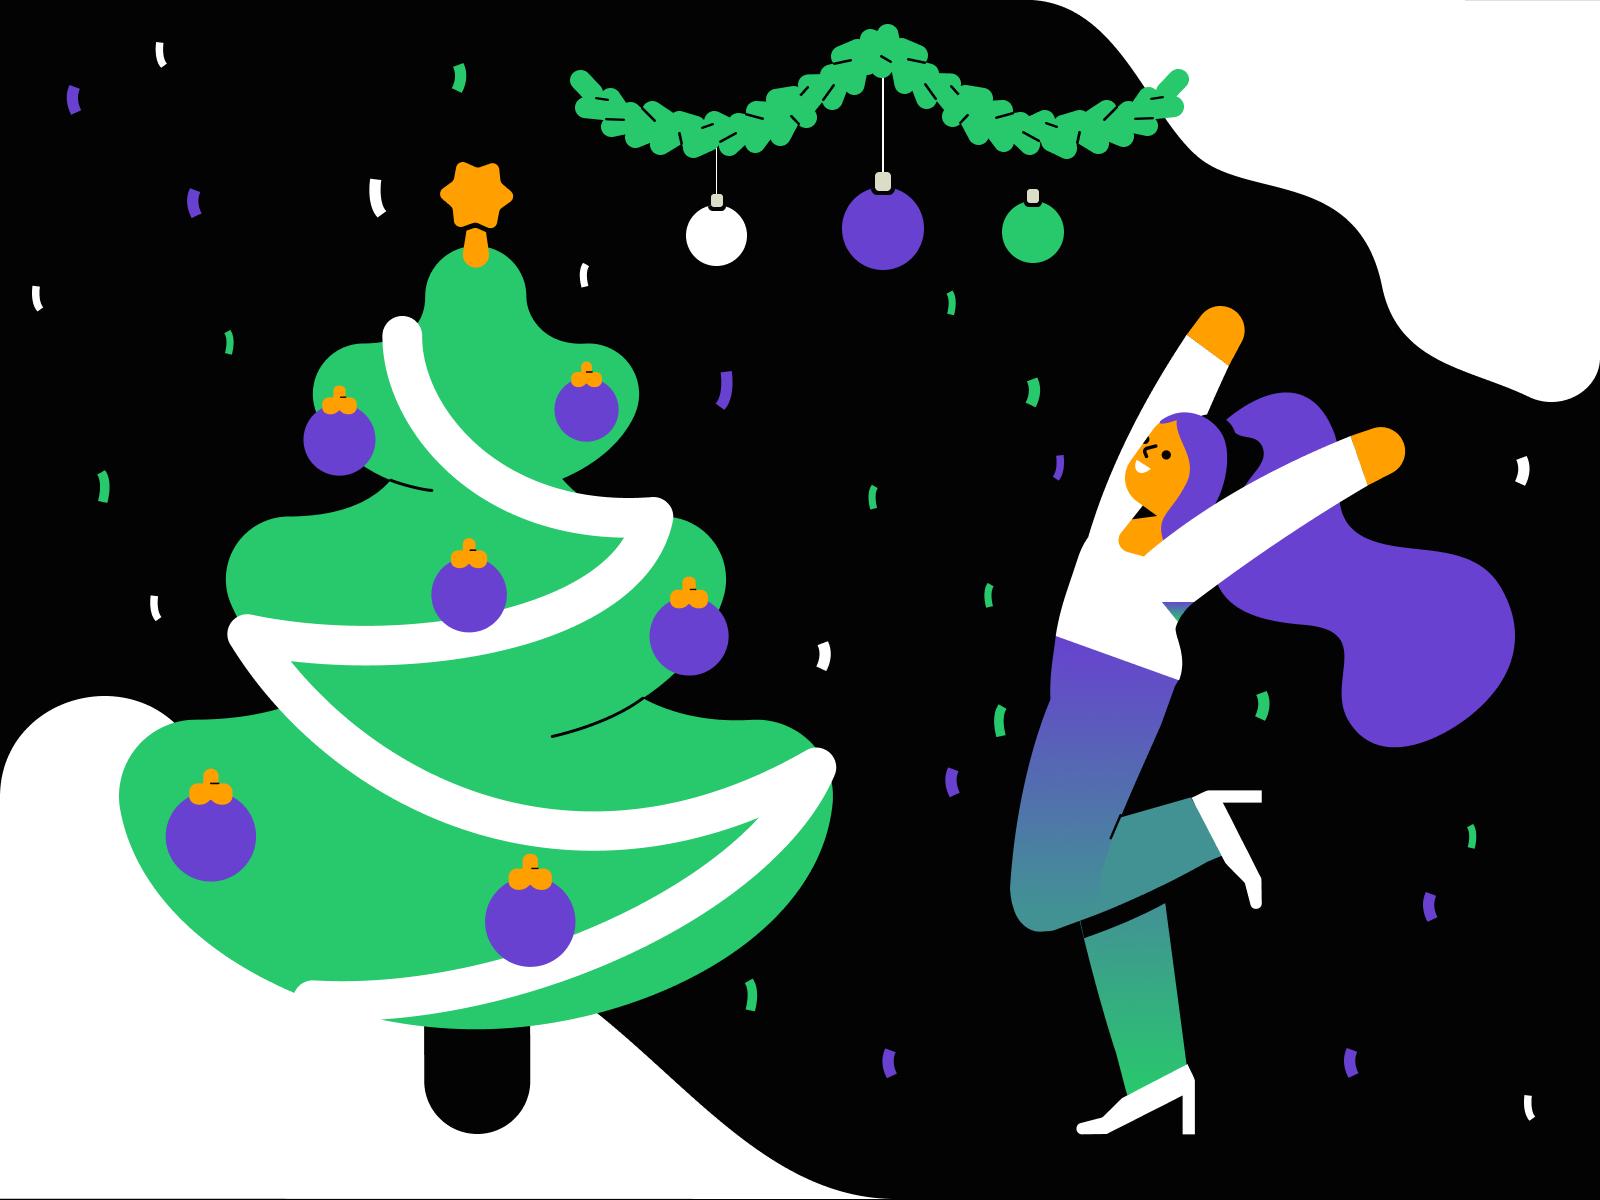 icons8 christmas illustration pablo